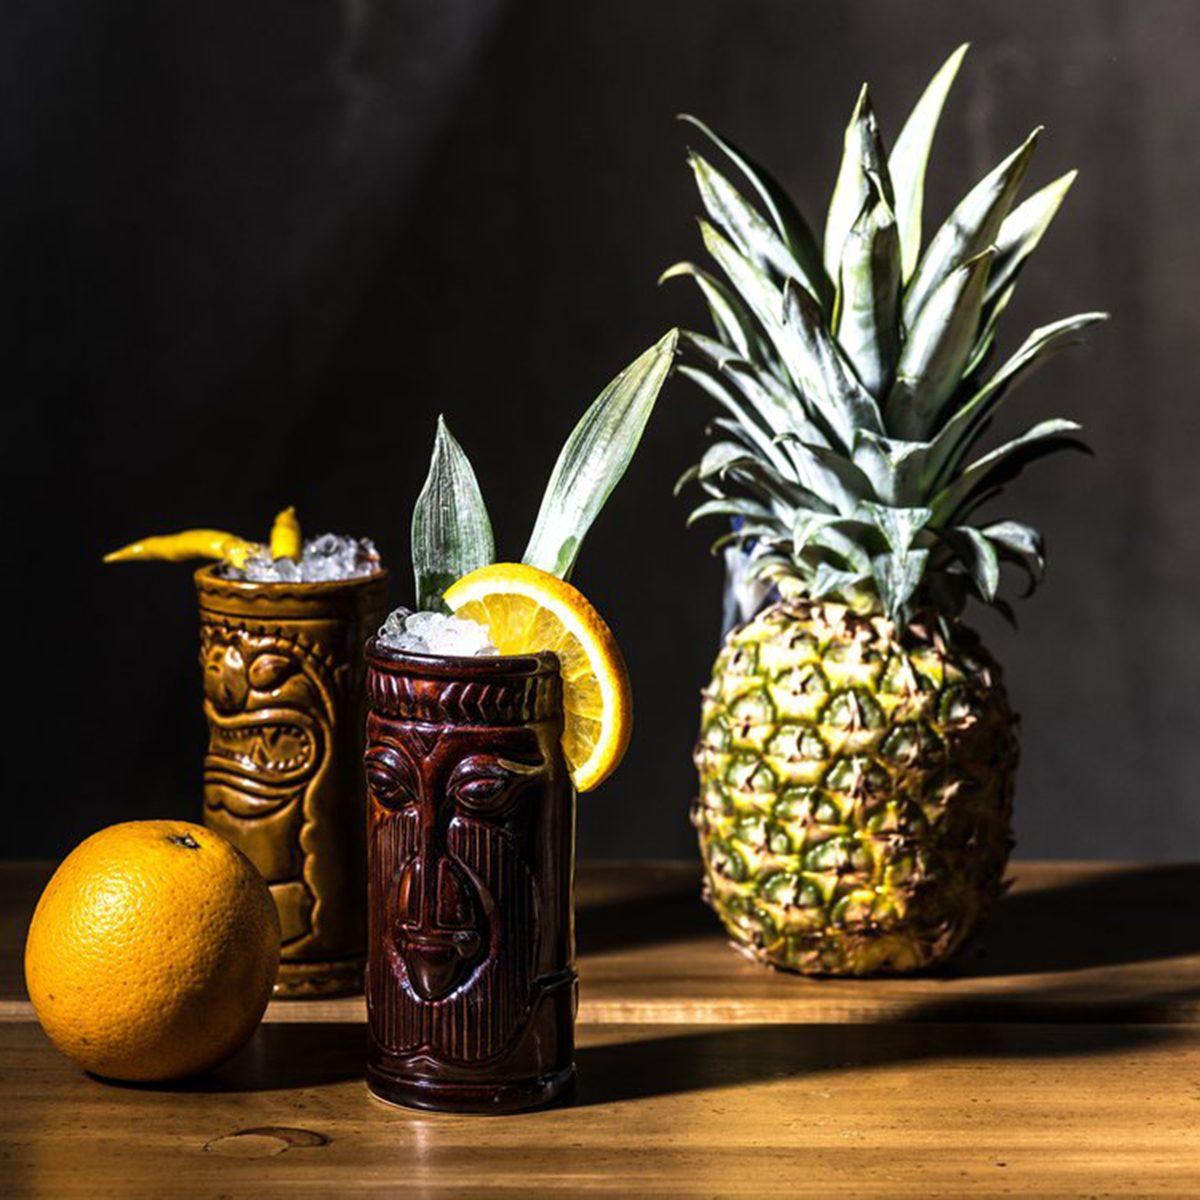 Tropical drinks